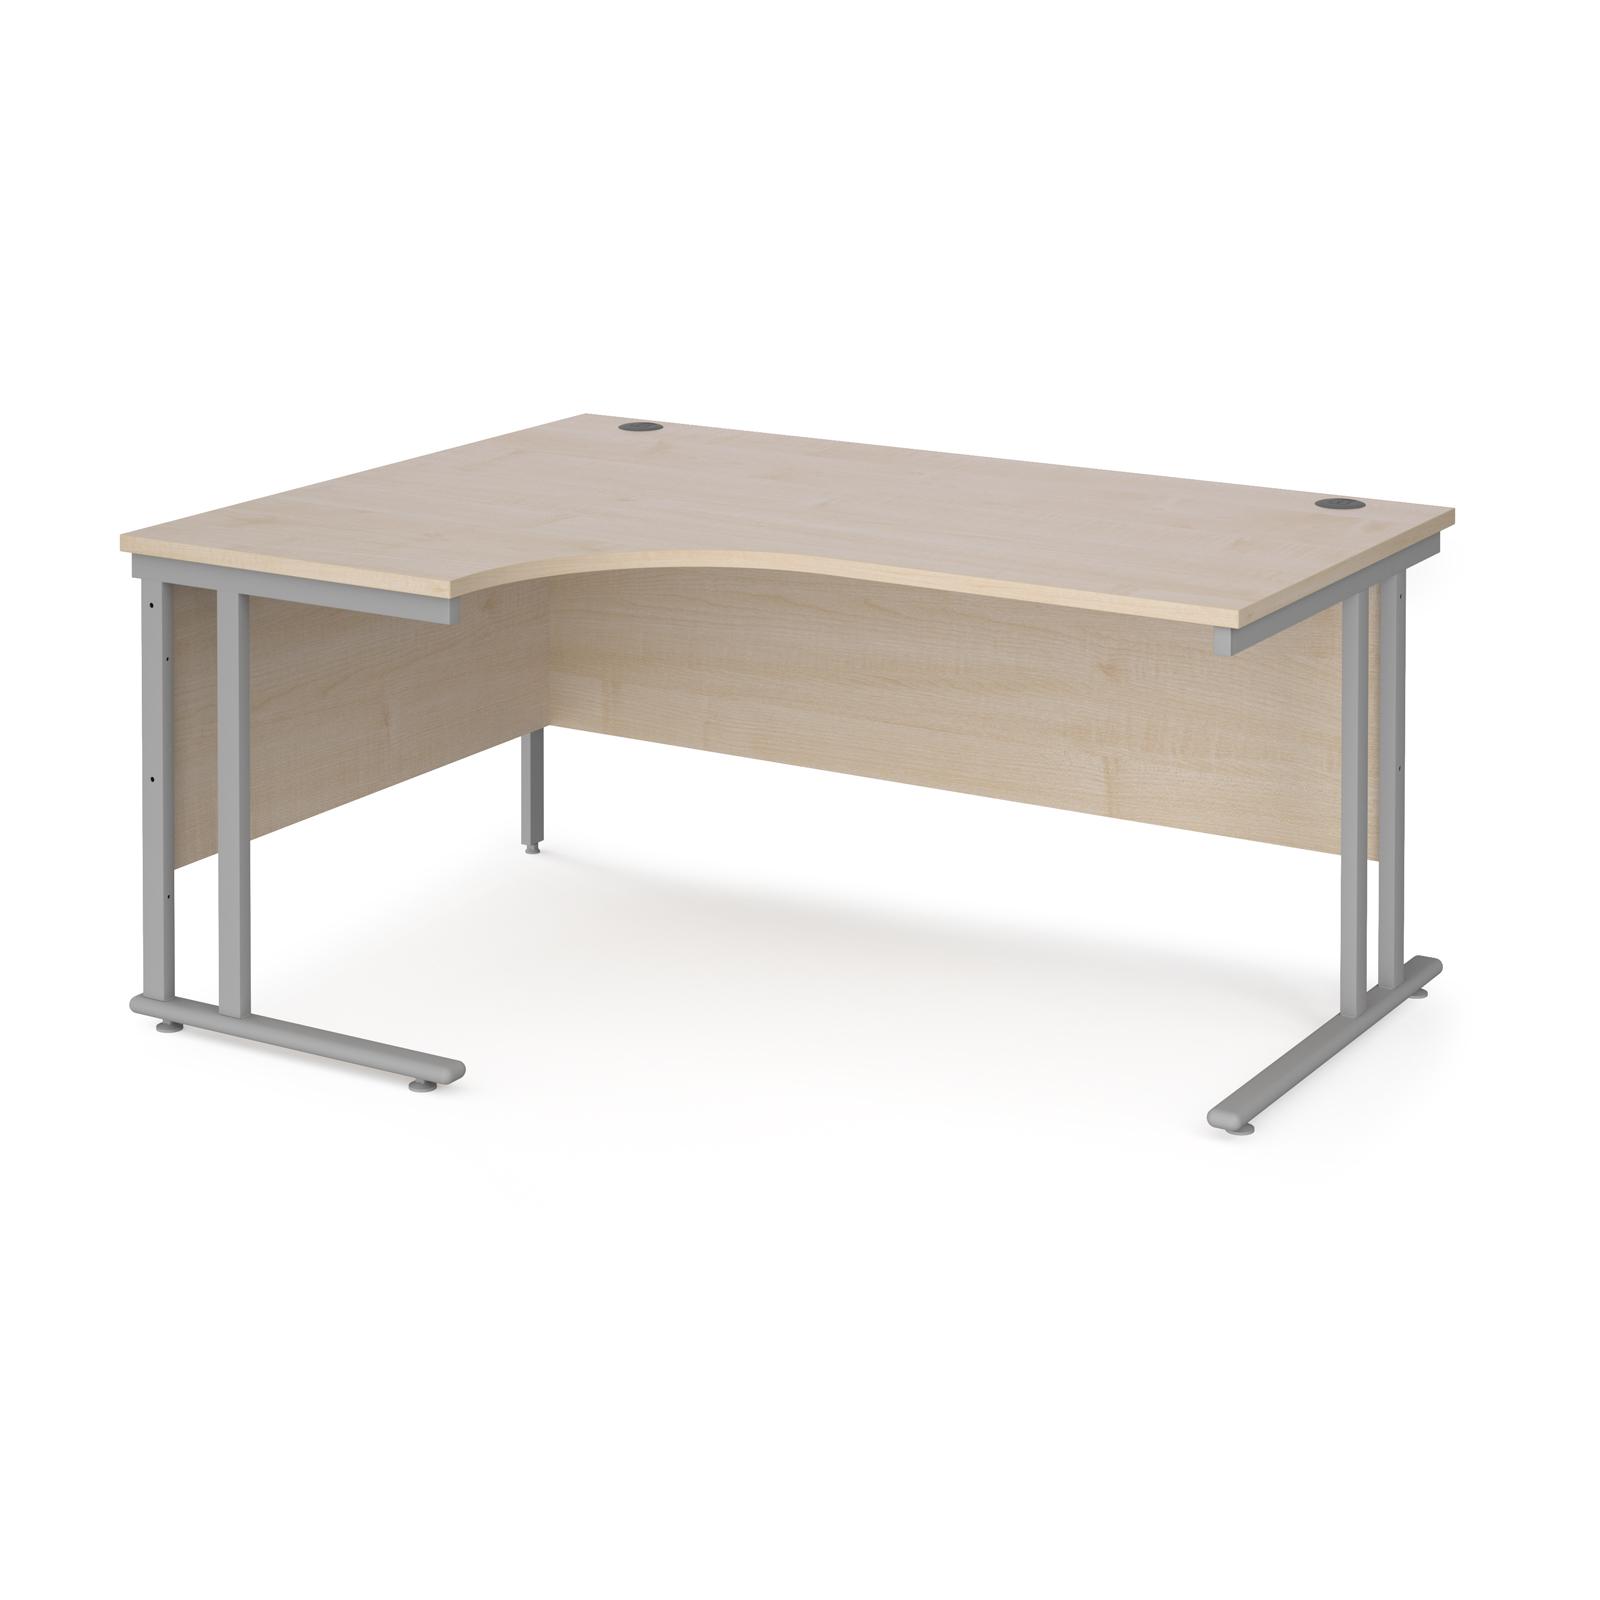 Maestro 25 left hand ergonomic desk 1600mm wide - silver cantilever leg frame, maple top